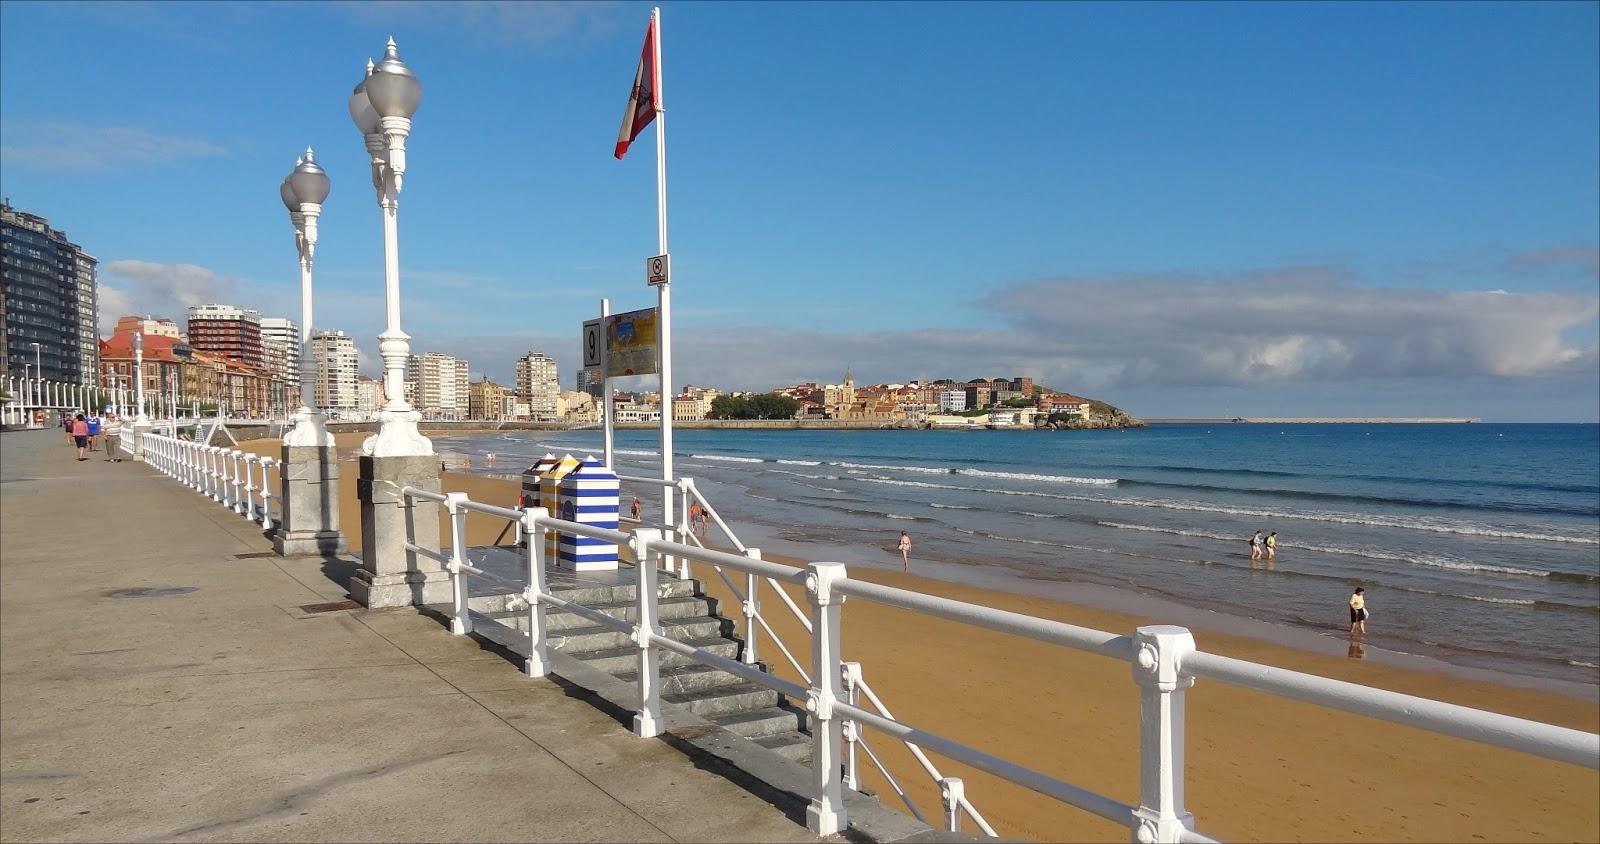 Asturias playas de gij n asturias iii - Fotos del sporting de gijon ...